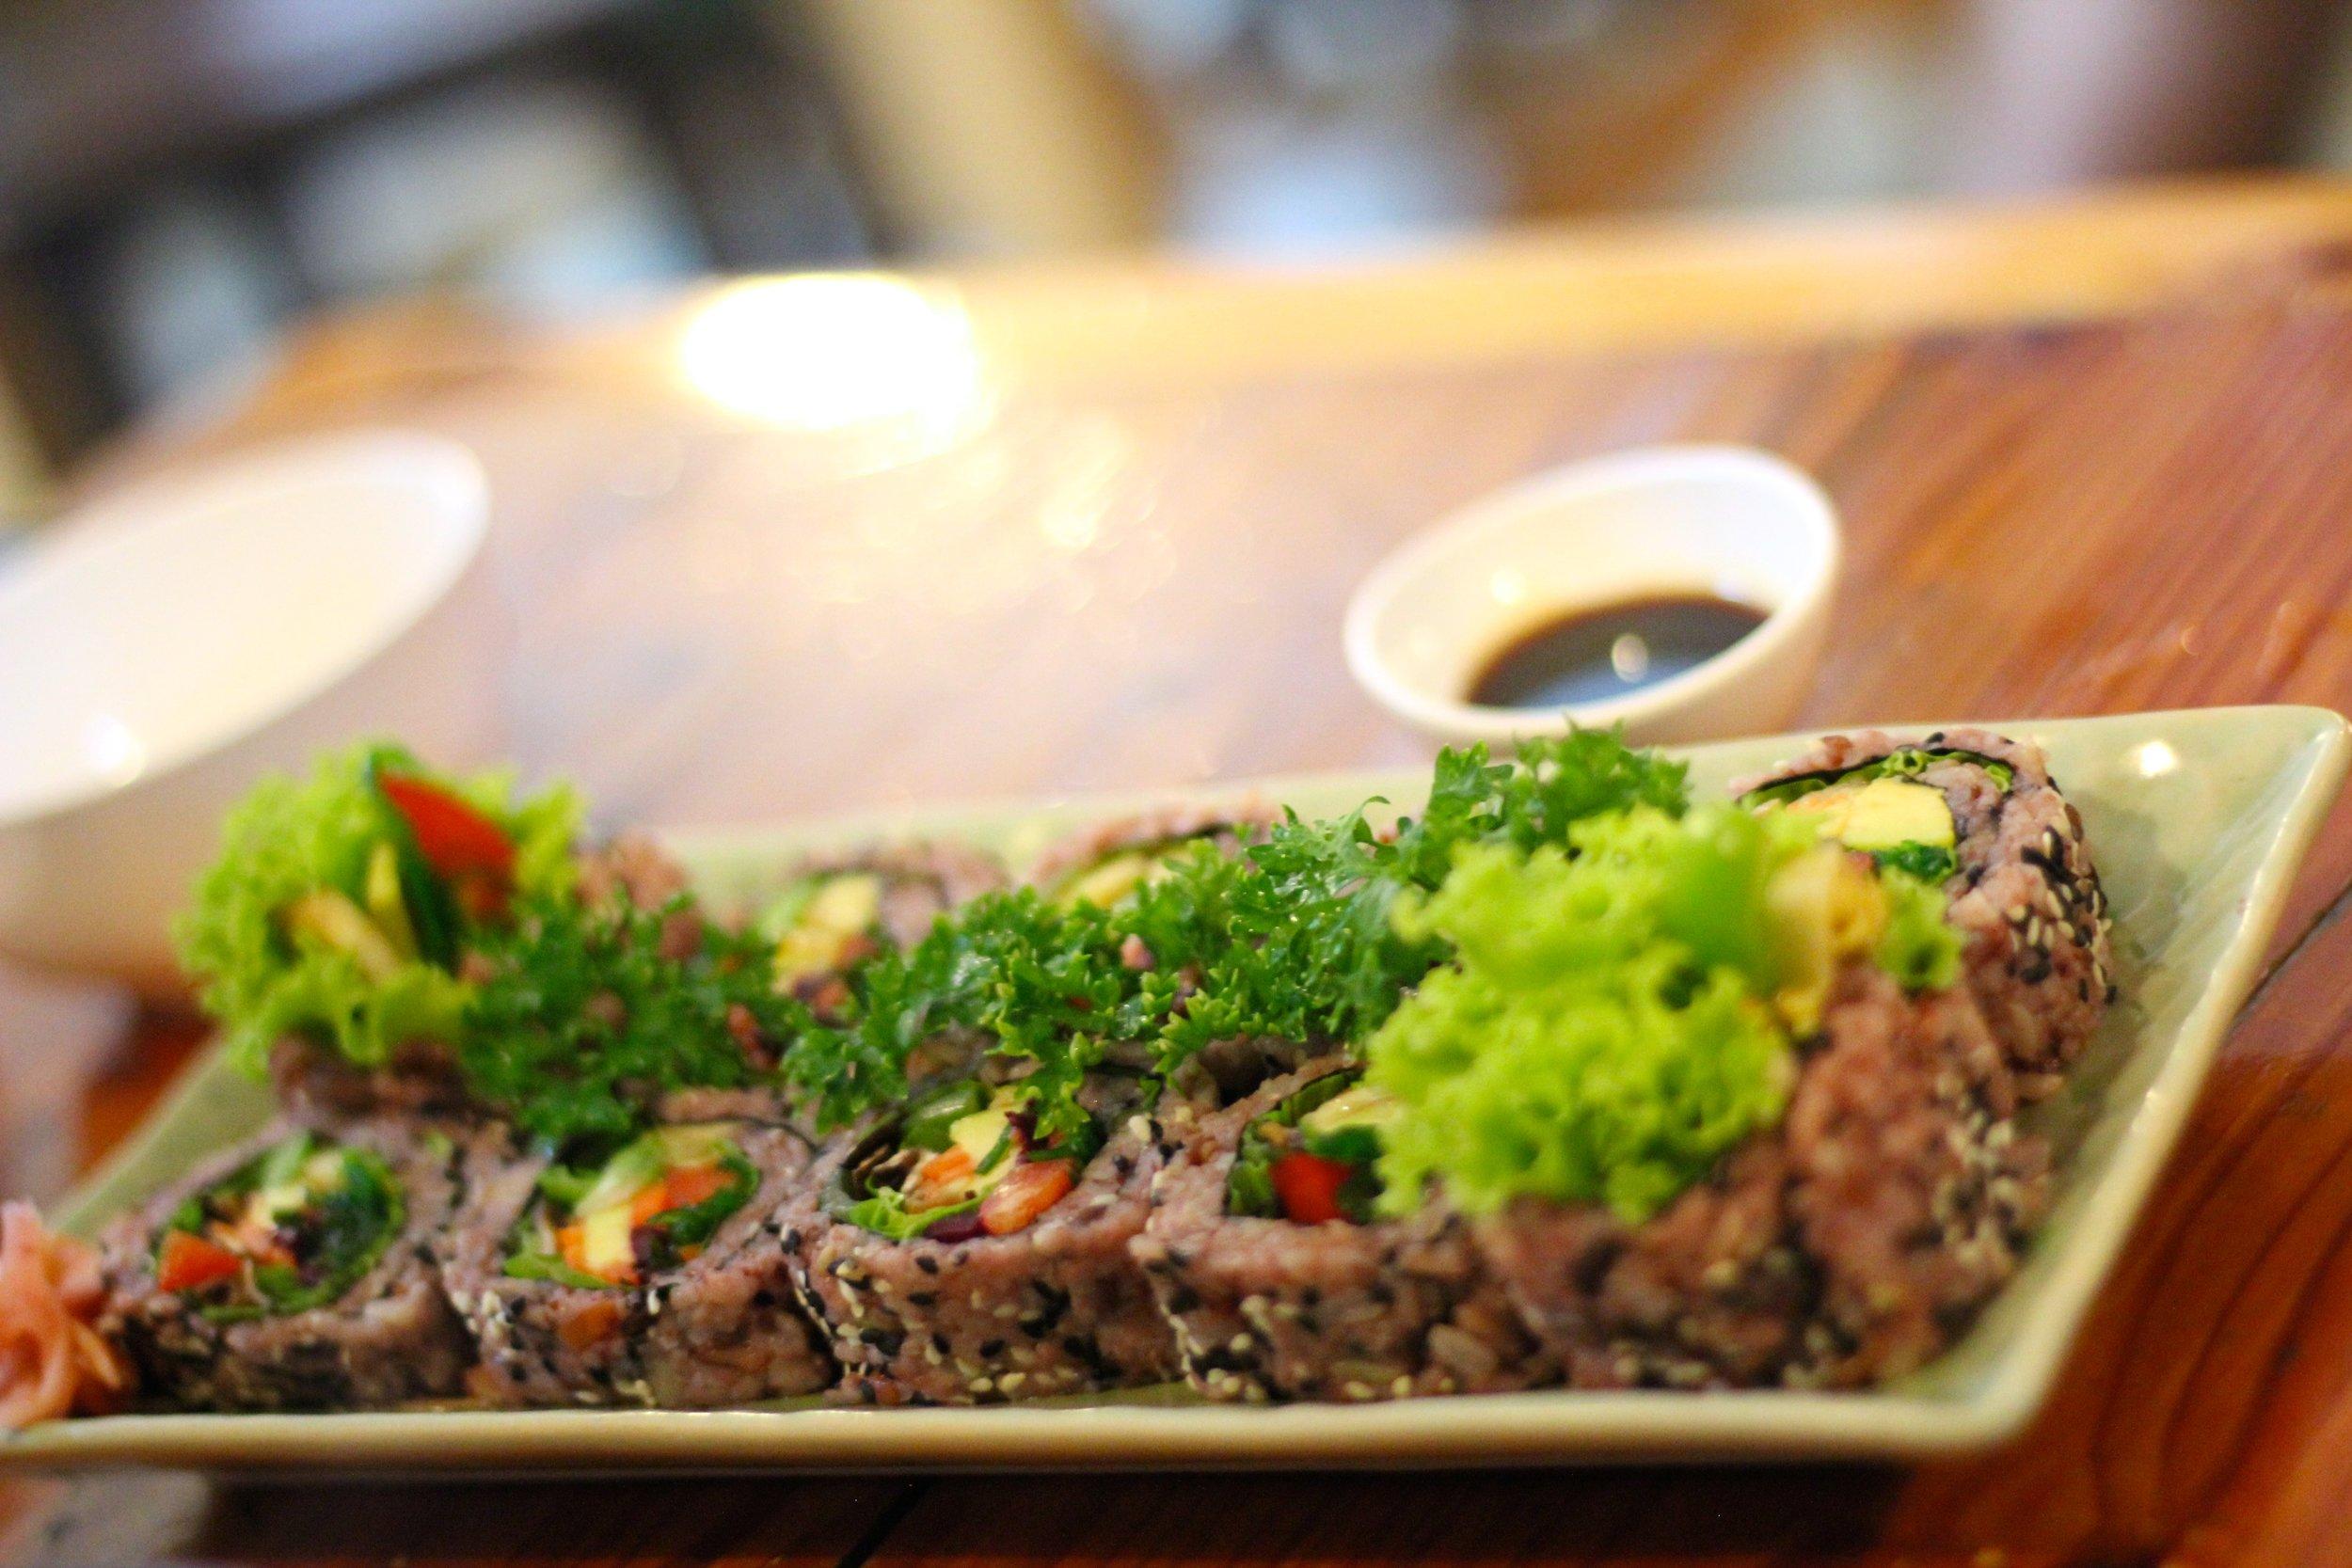 Sushi from Aum Vegetarian